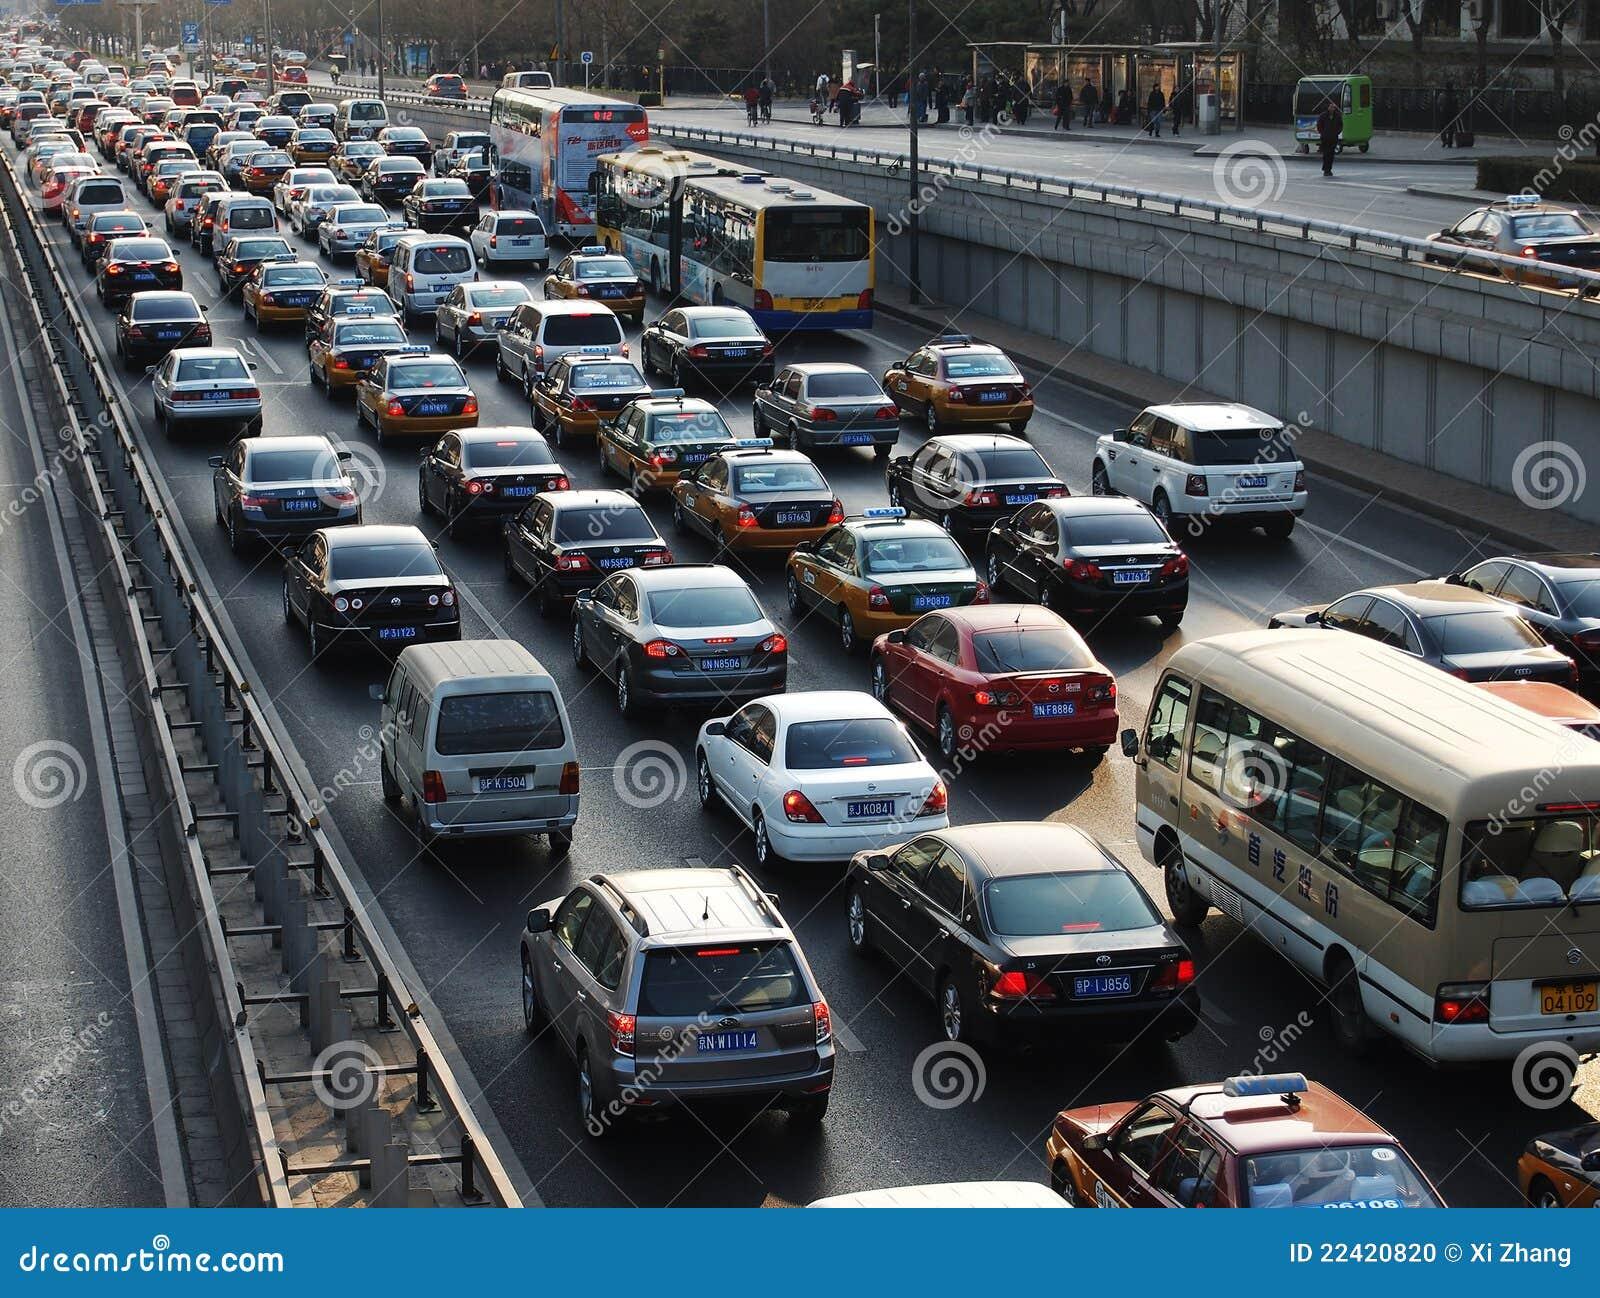 Störung- und Luftverschmutzung des Peking-starken Verkehrs